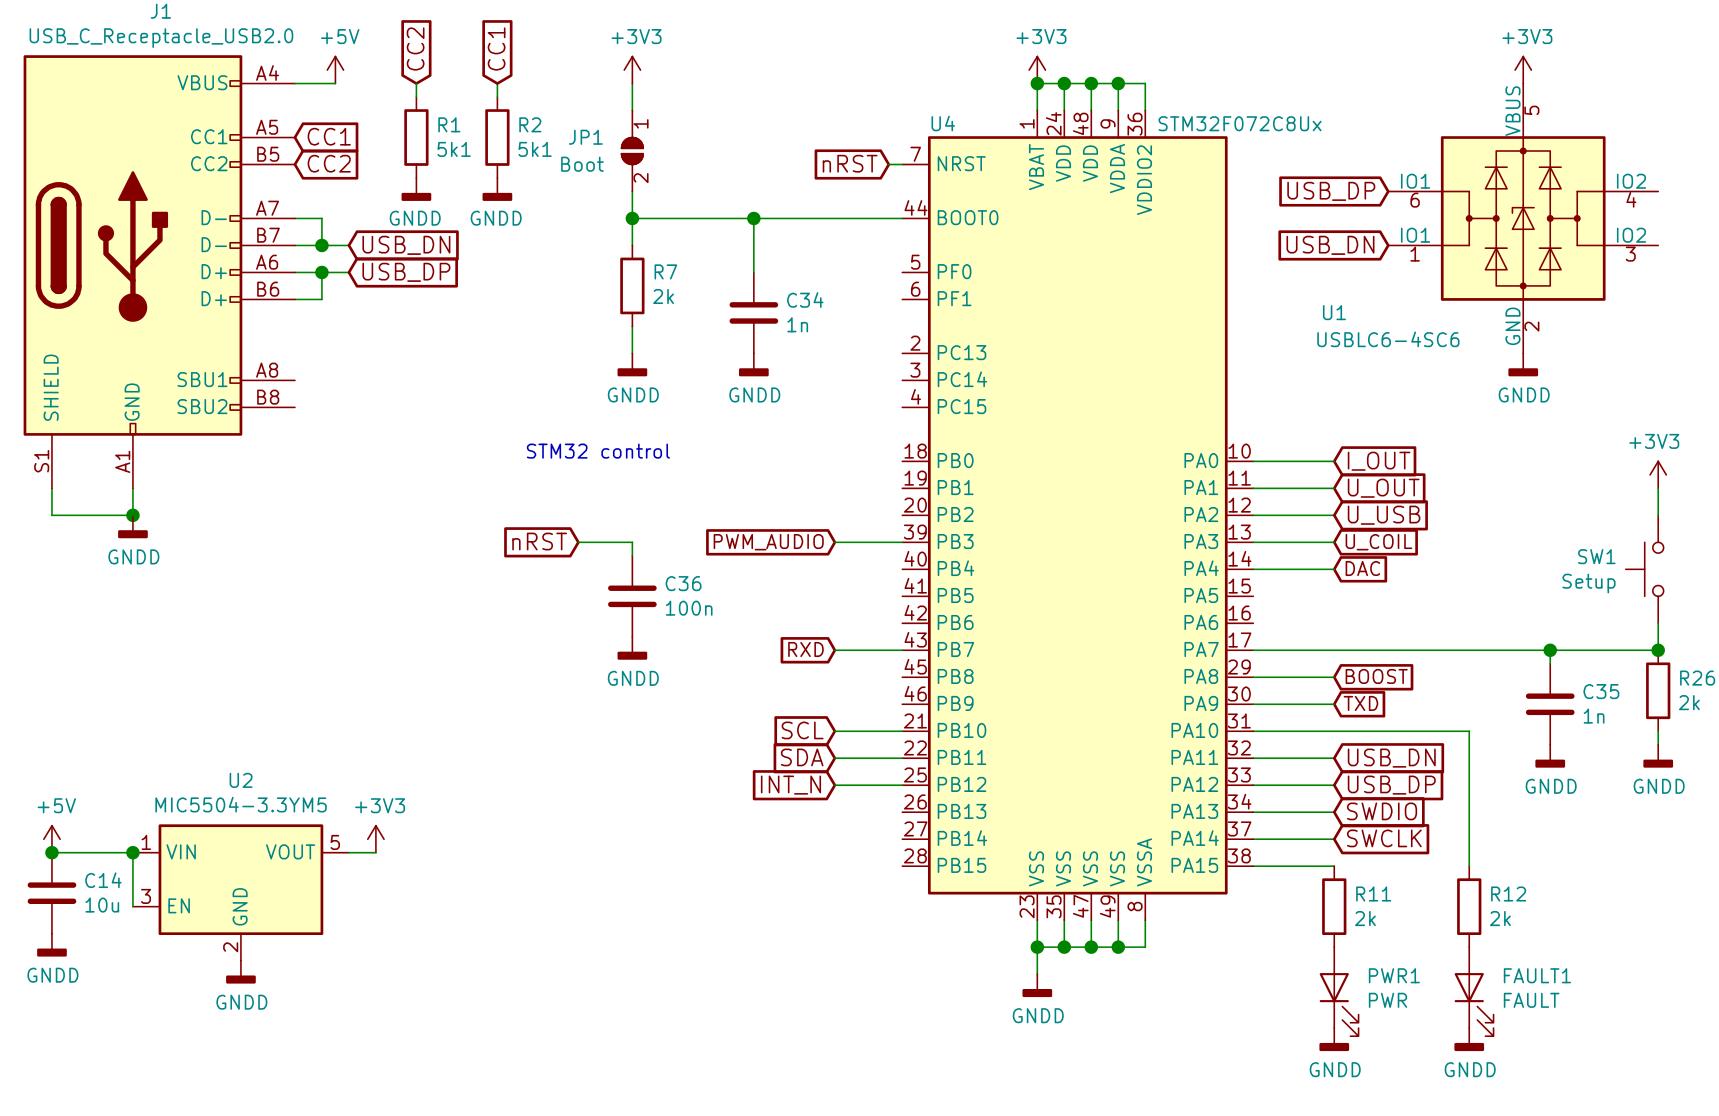 pcbtc (GaN edition) | aday.io on usb port diagram, amplifier symbol, quick connect symbol, usb charger schematic, usb type a schematic, usb cad symbol, usb cable symbol, usb cable schematic, capacitor circuit symbol, usb 2.0 cable diagram, block valve symbol, usb charger circuit, usb schematic diagram, usb wire diagram and function, usb to rs232 schematic, usb power symbol, usb 3.0 pinout diagram, usb connector schematic, usb wiring schematic, usb 3.0 wiring-diagram,